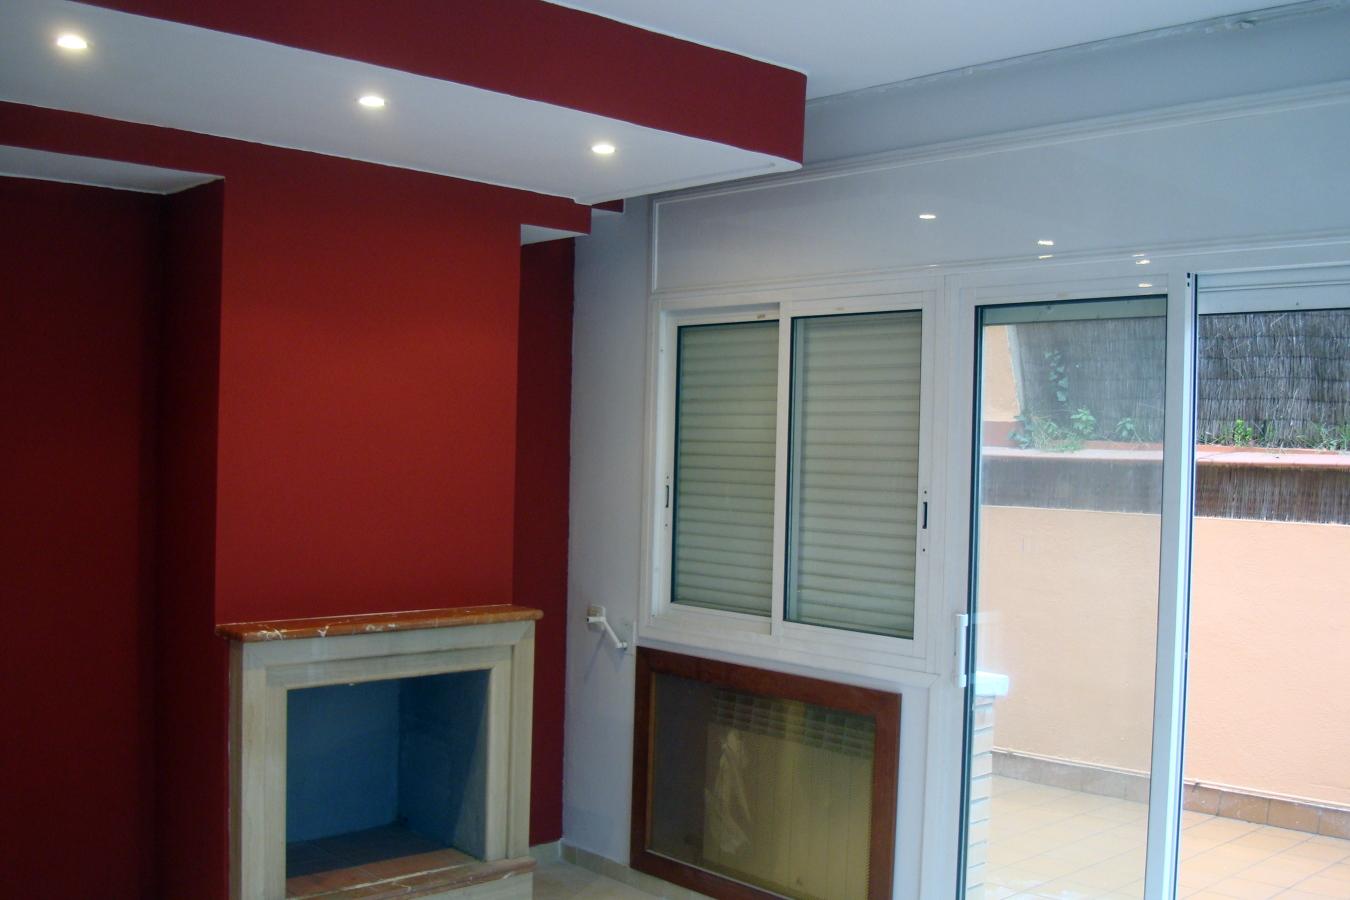 Pintar casa ideas pintores - Presupuesto pintar casa ...